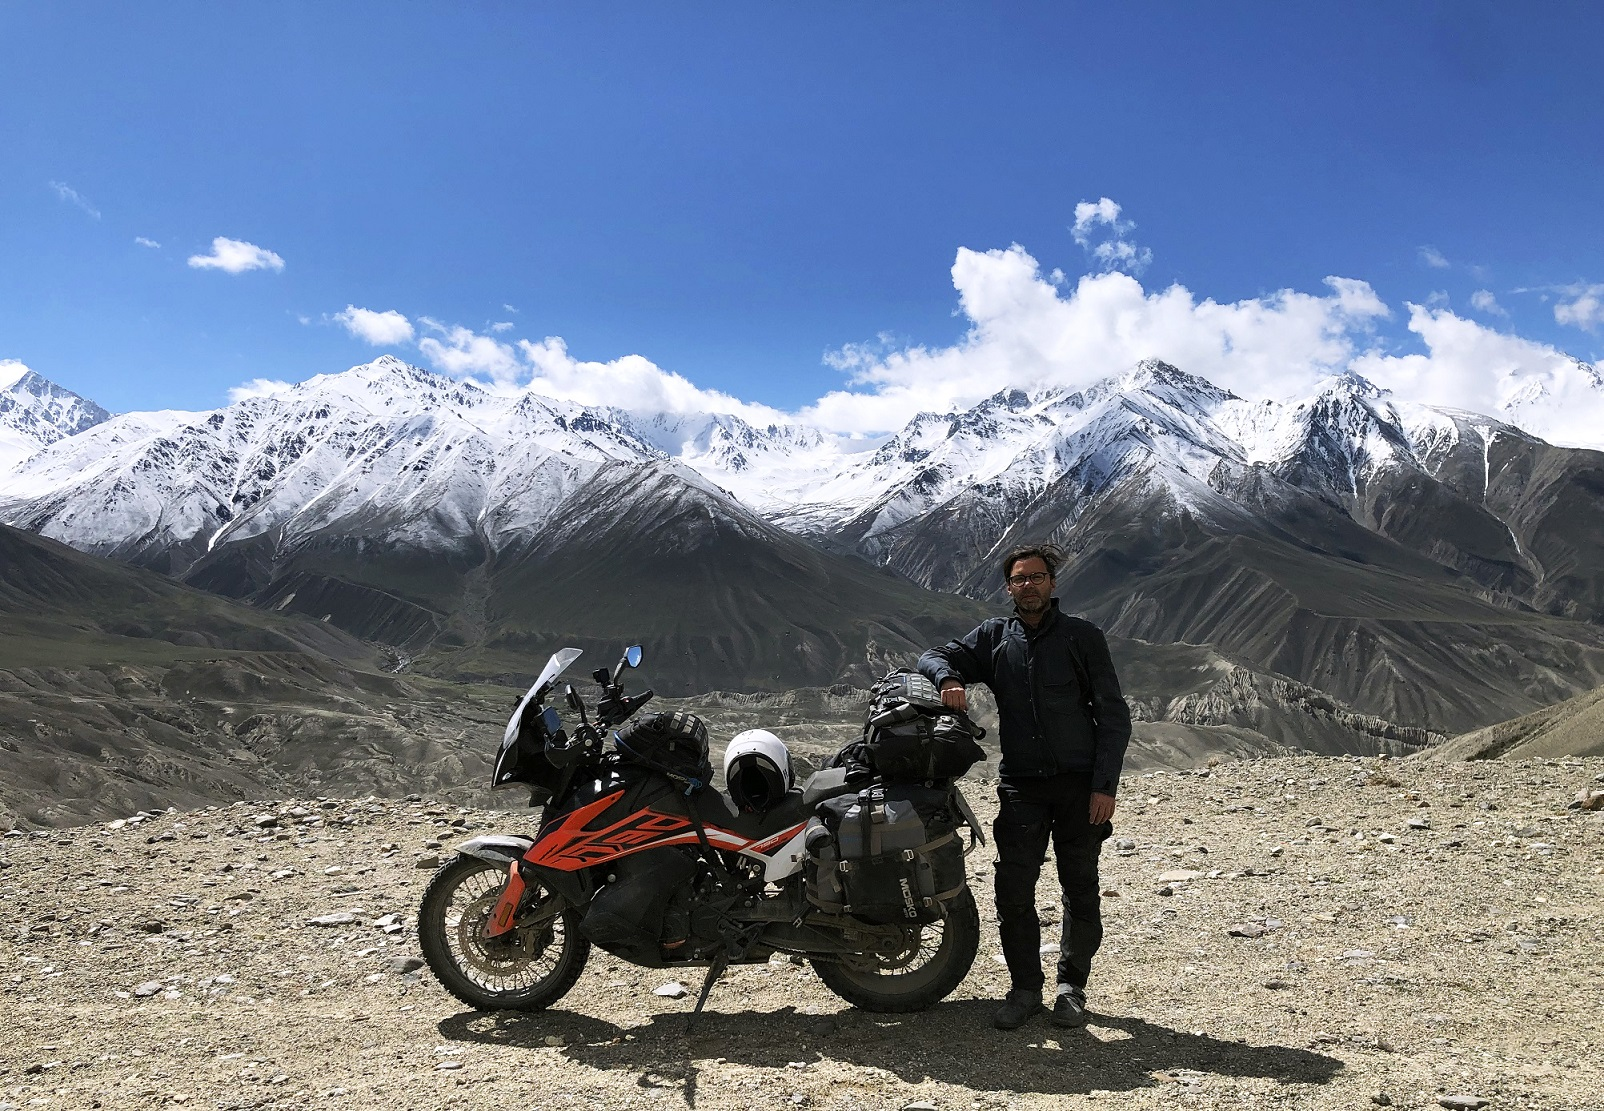 Ktm Dealers Ontario >> Madrid To Mongolia On A Ktm 790 Adventure Ktm Blog